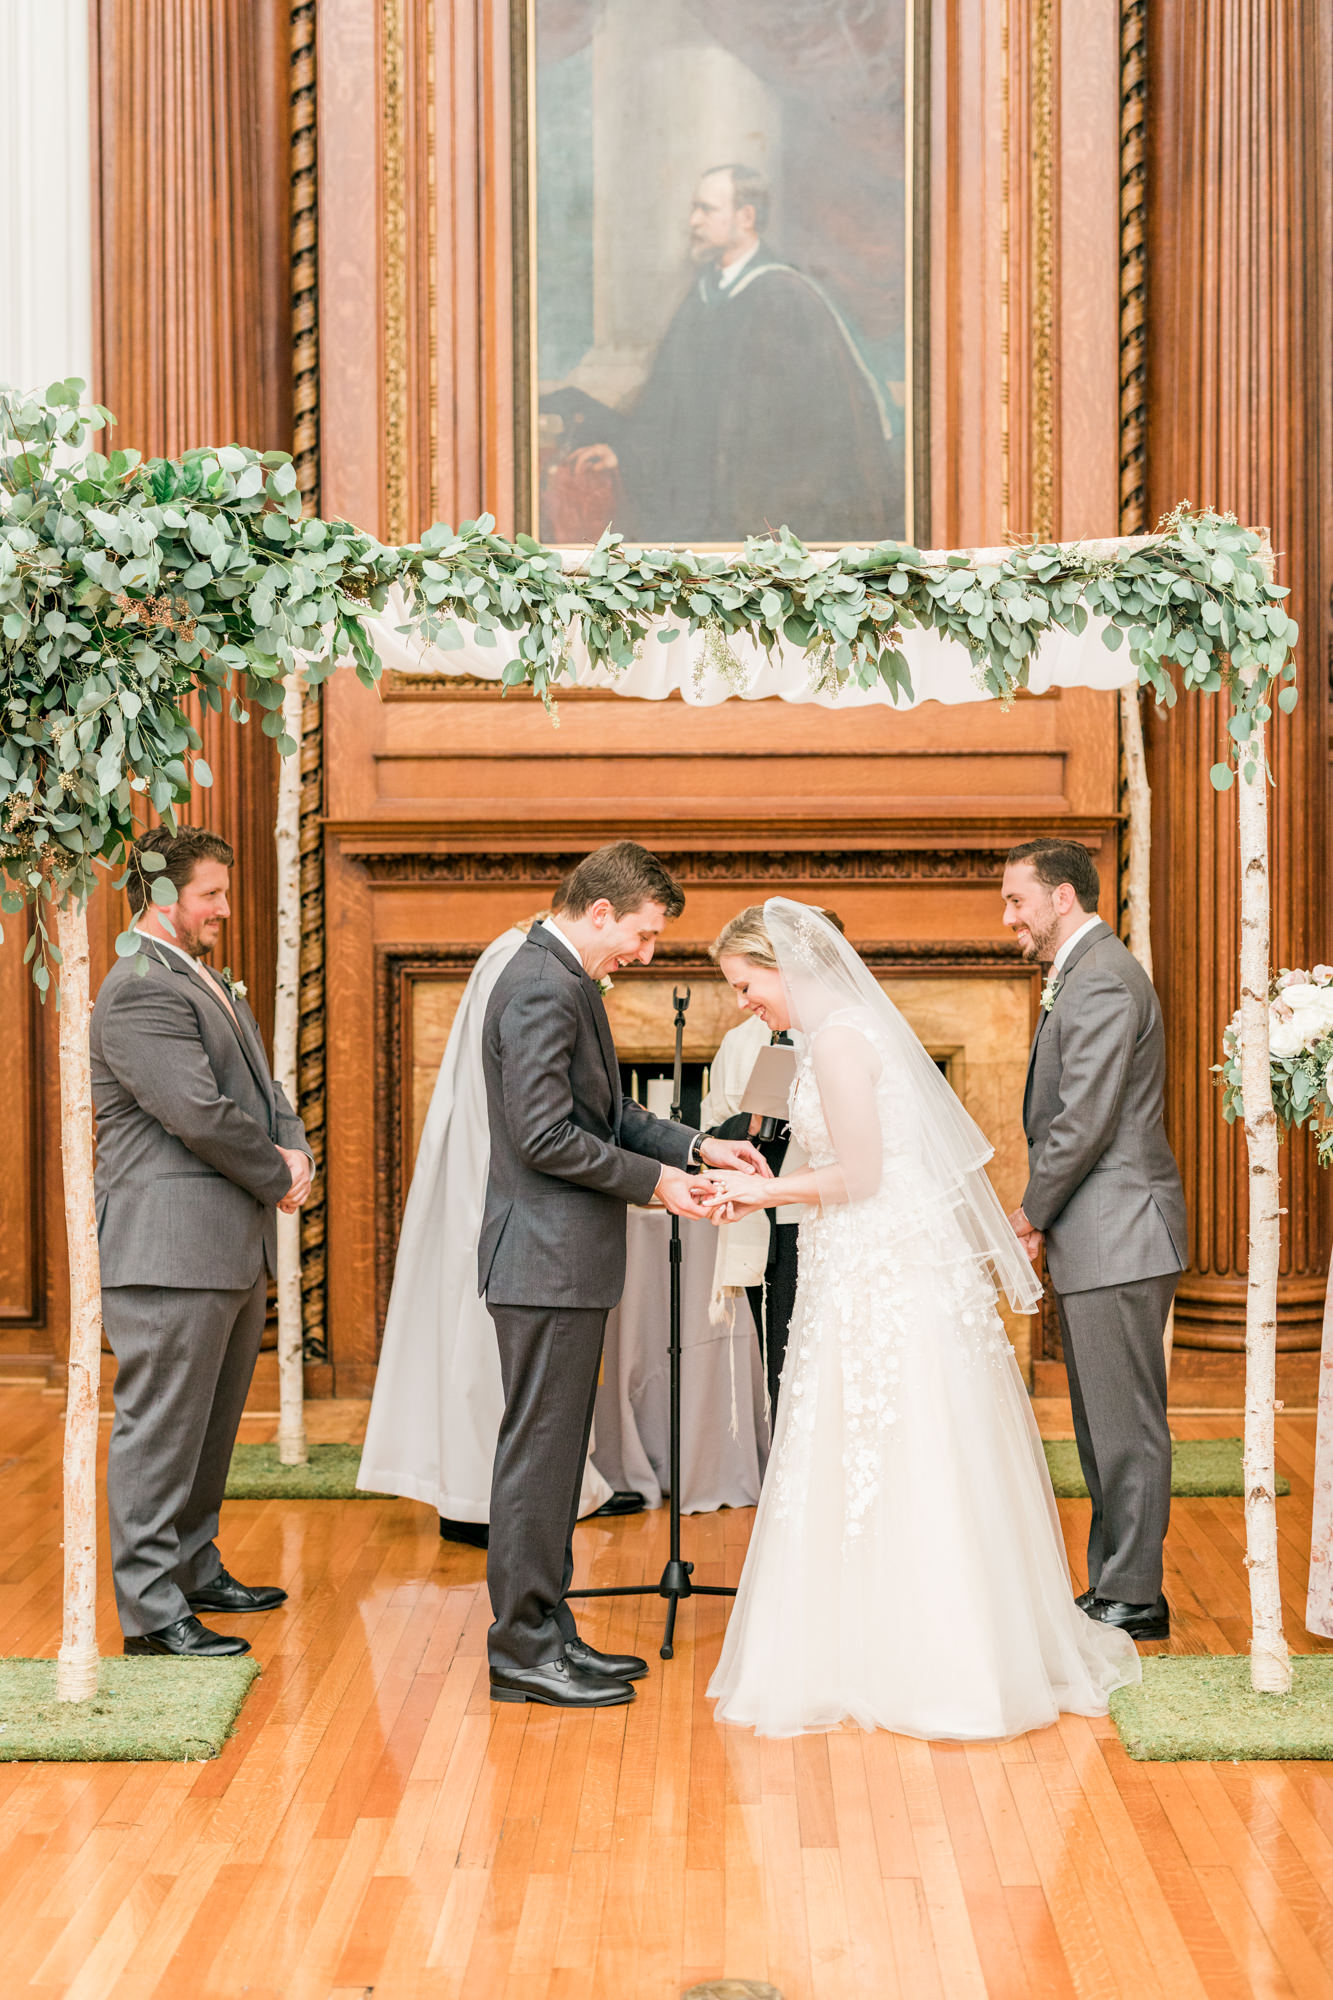 haley-richter-photography-autumn-college-of-physicians-wedding-philadelphia--267.jpg